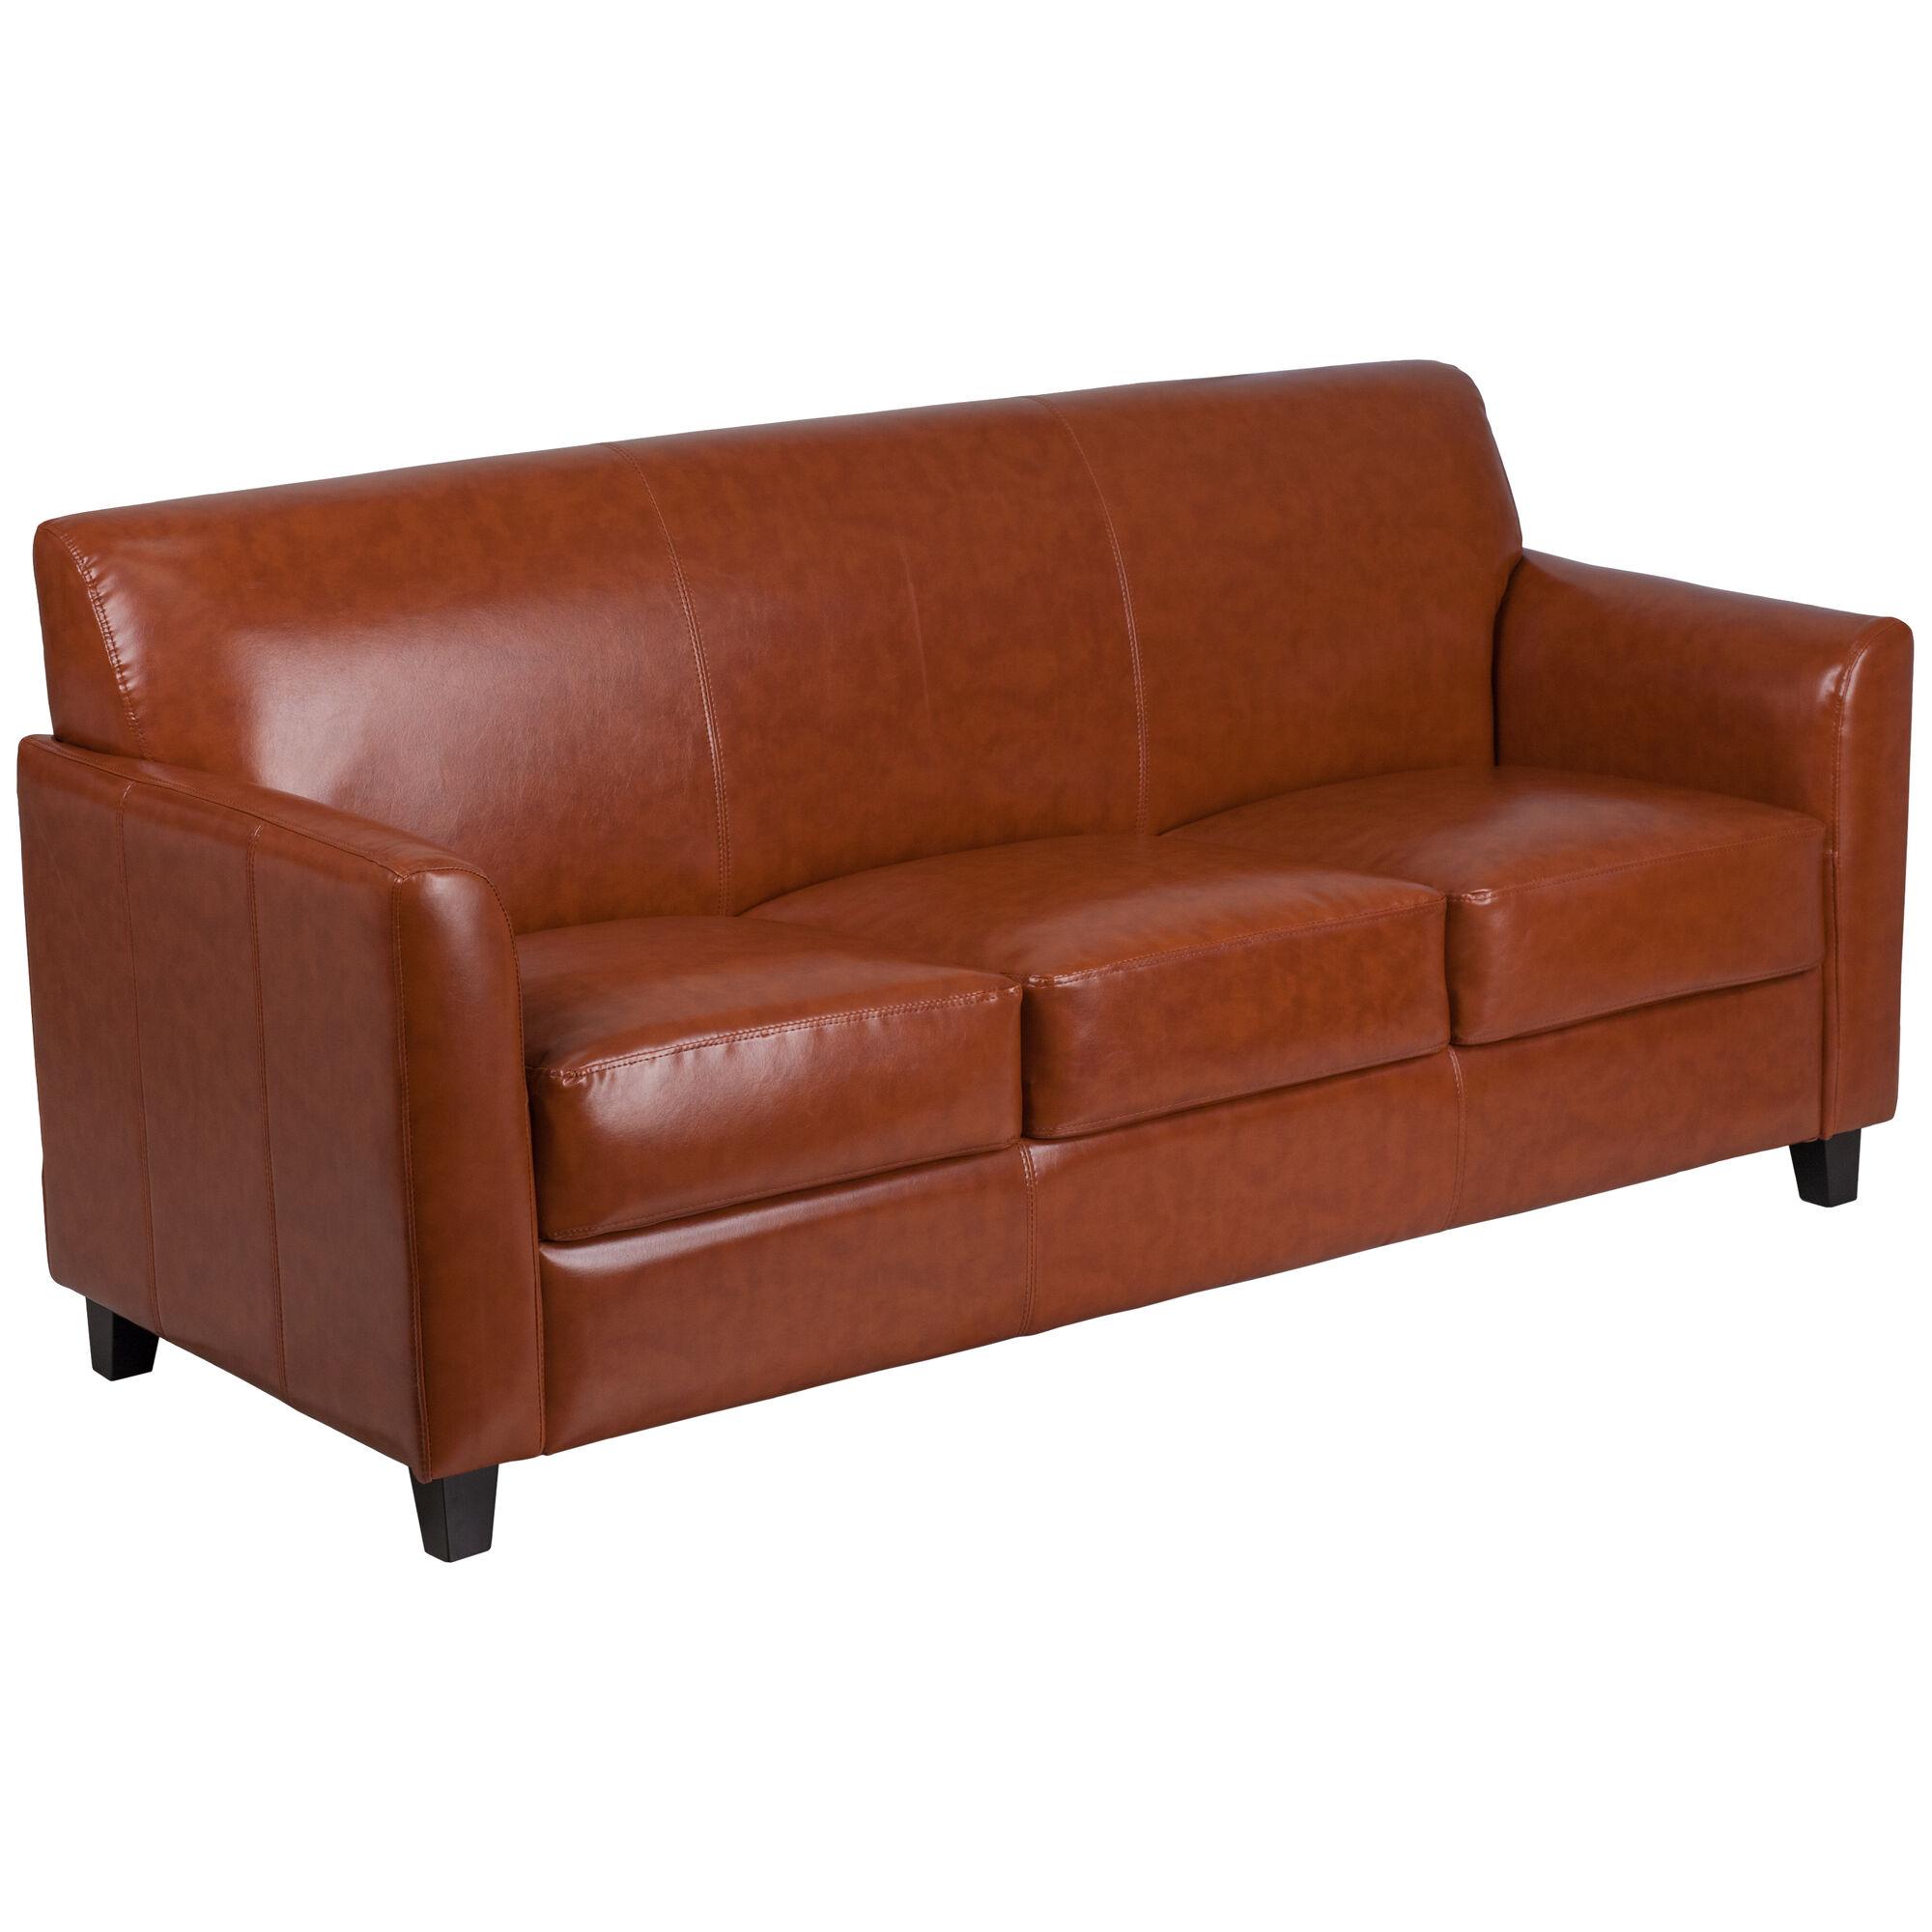 cognac leather sofa bt 827 3 cg gg. Black Bedroom Furniture Sets. Home Design Ideas